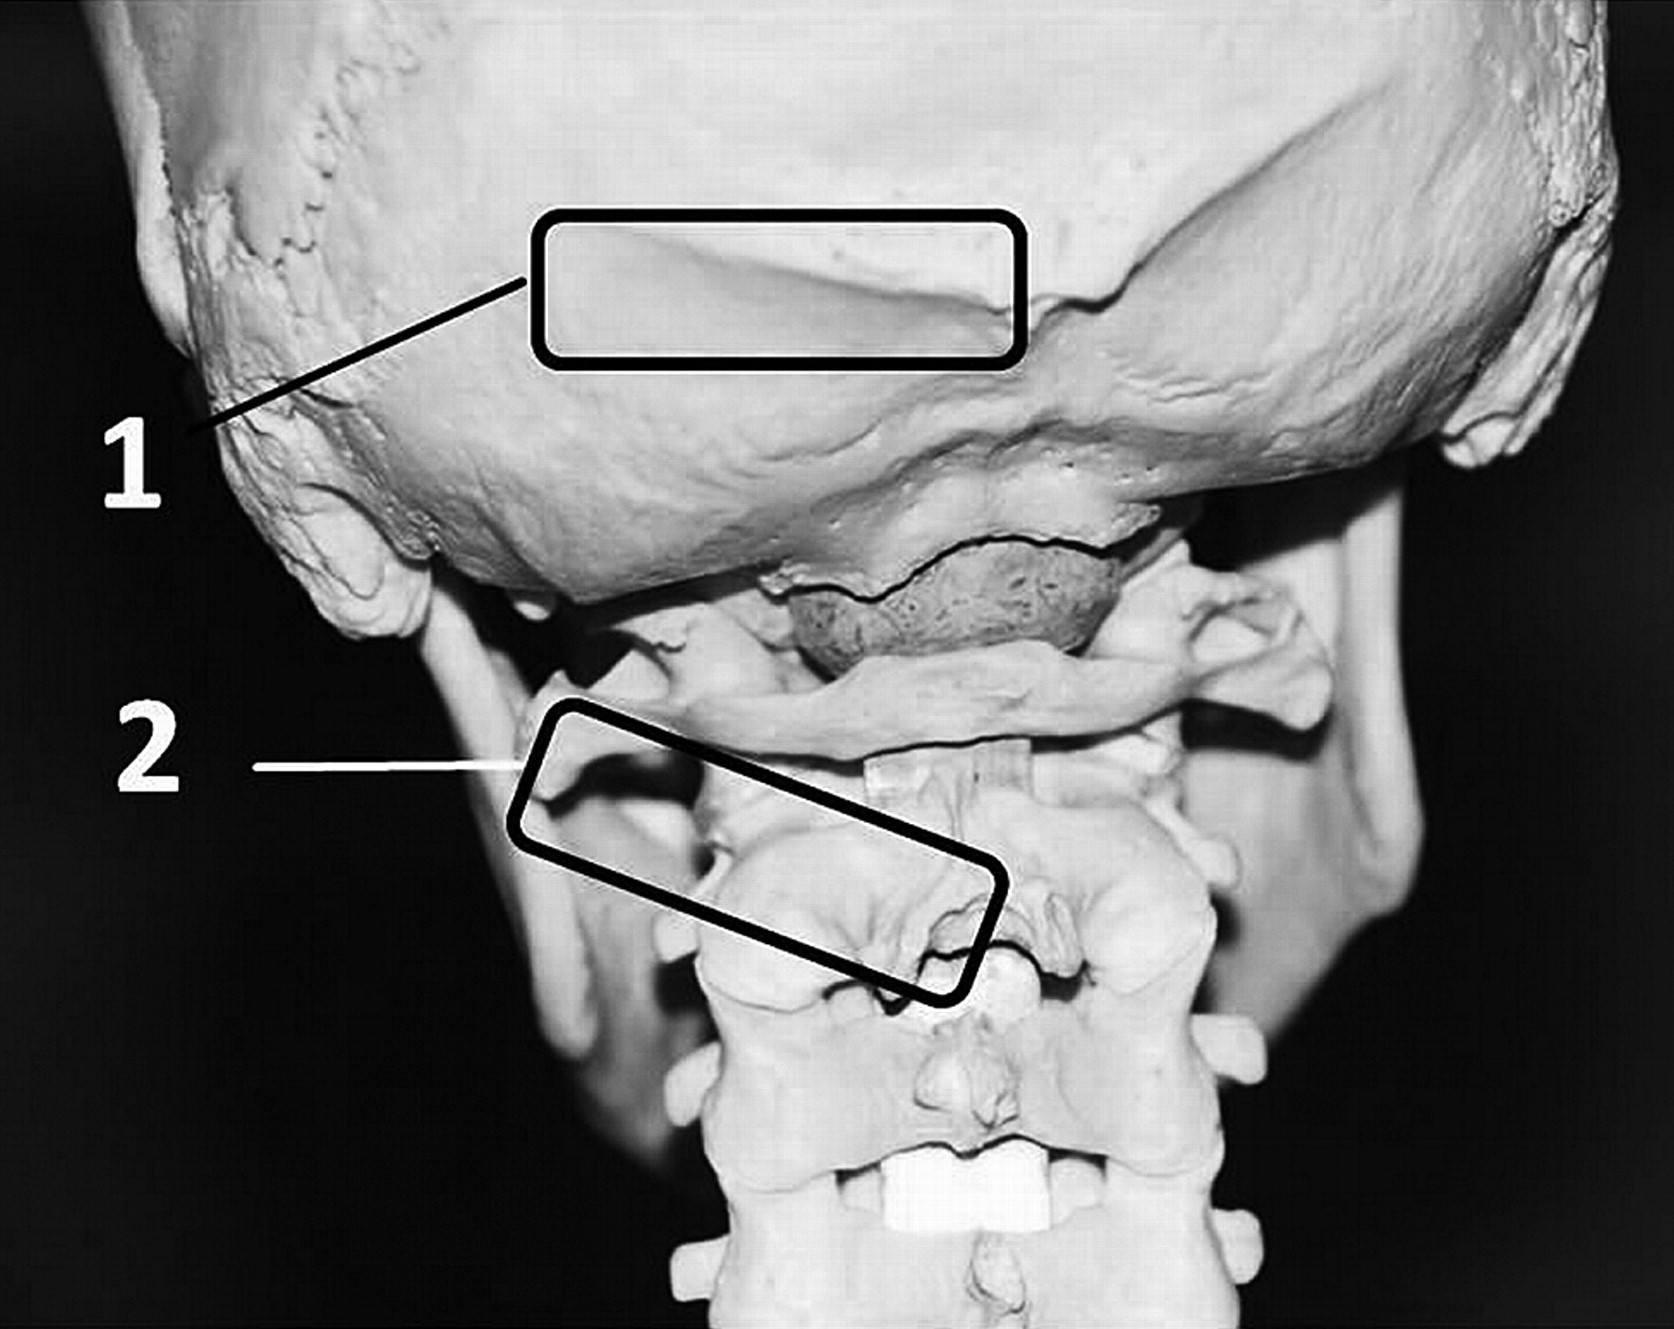 Occipital Nerve Location